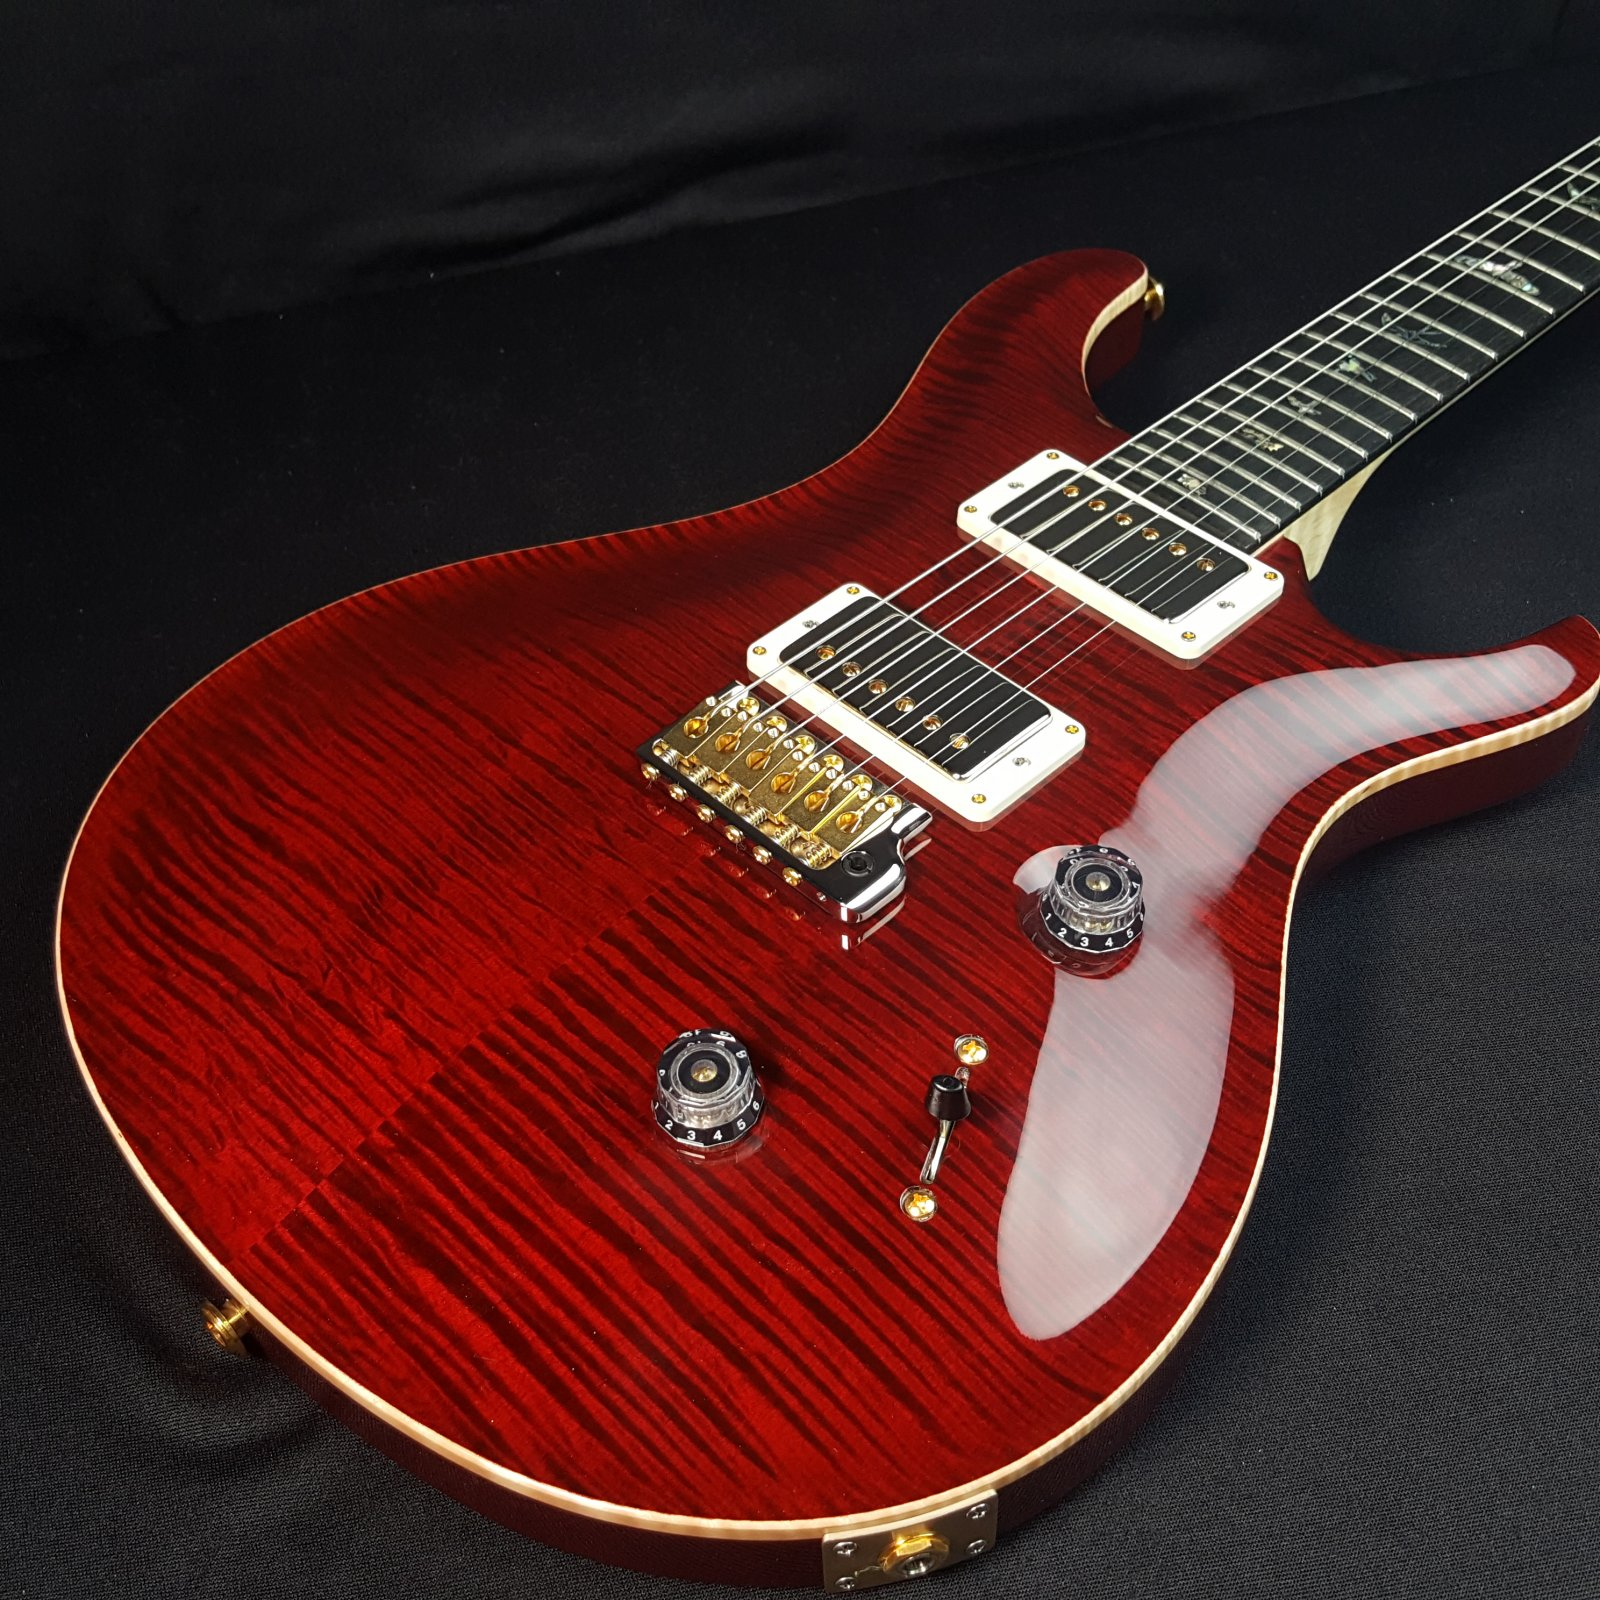 Paul Reed Smith PRS Custom 24 Artist Package Black Cherry Hybrid